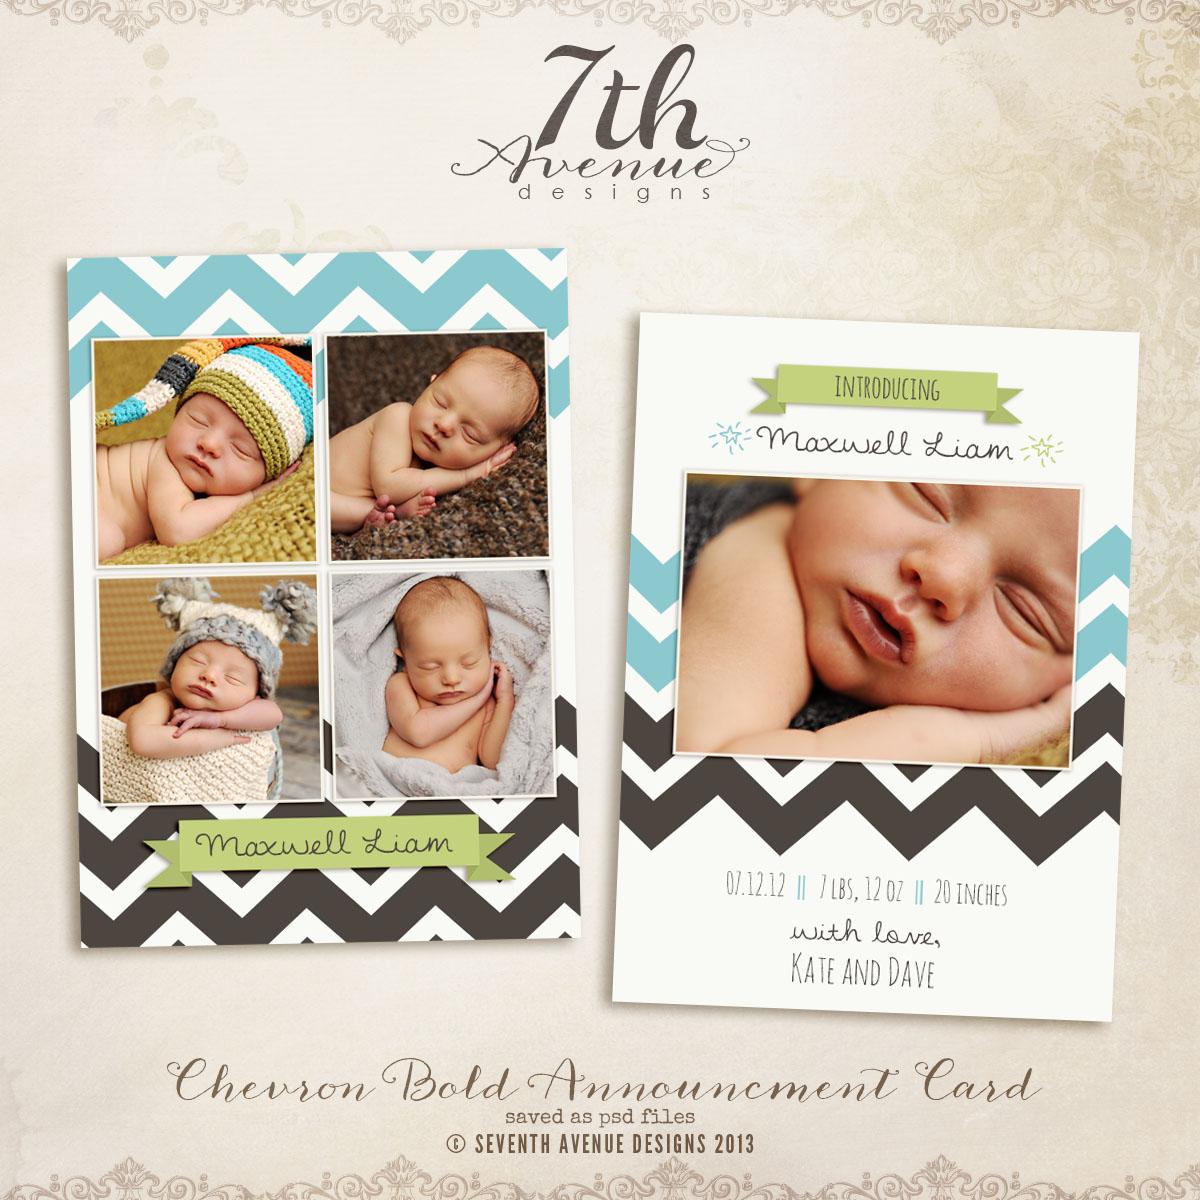 BIRTH ANNOUNCEMENT CARDS 7thAvenue Designs Logo and Templates – Baby Announcement Card Templates